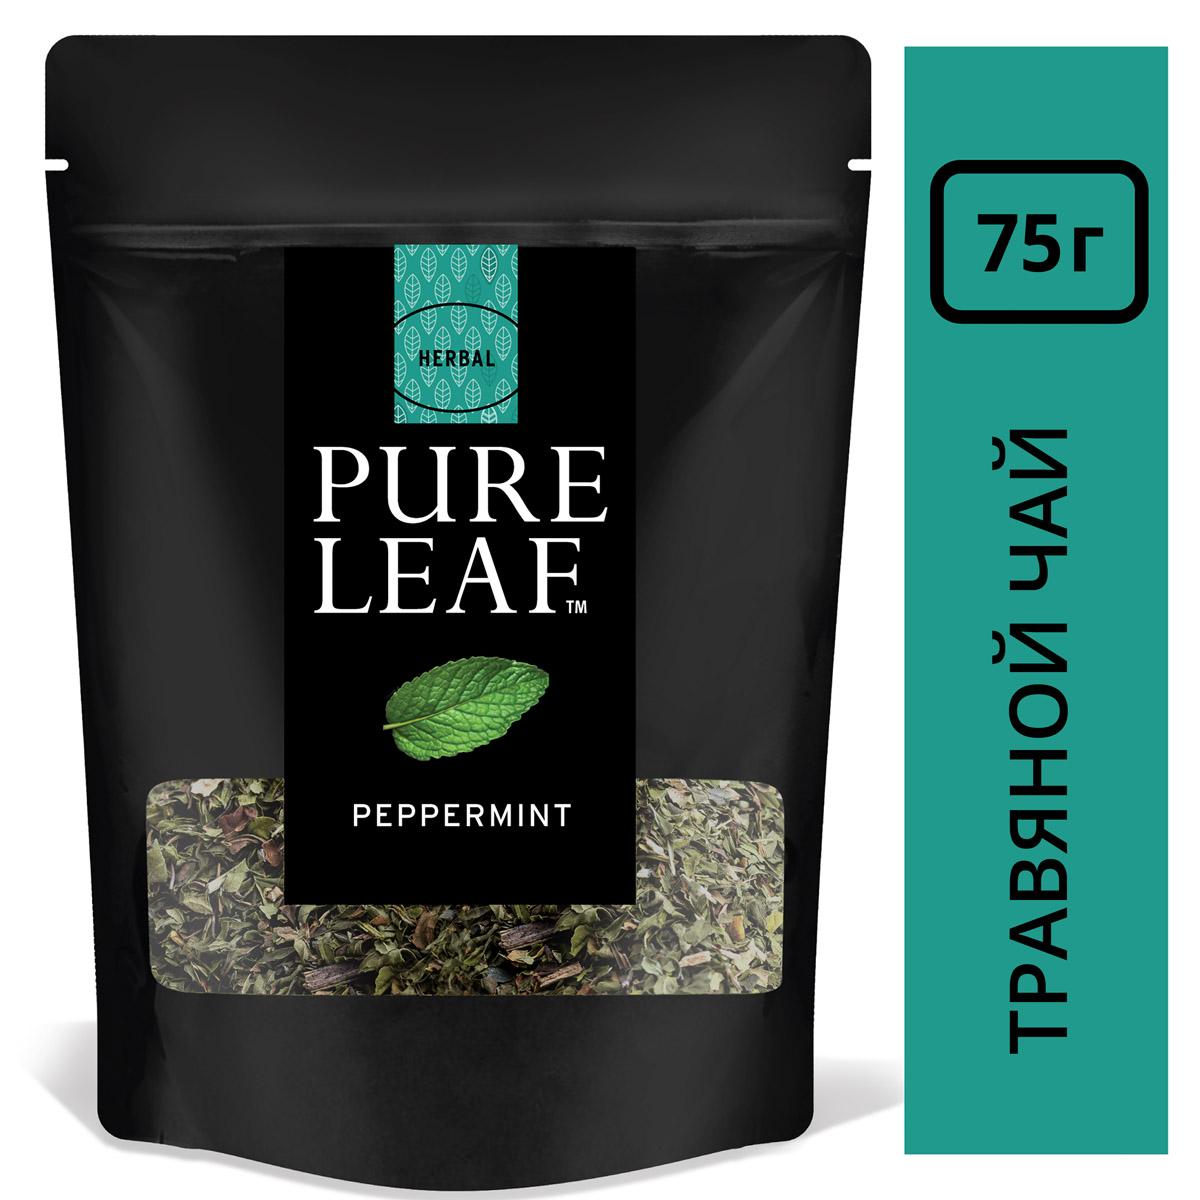 PURE LEAF травяной напиток Peppermint - Крупнолистовой чай